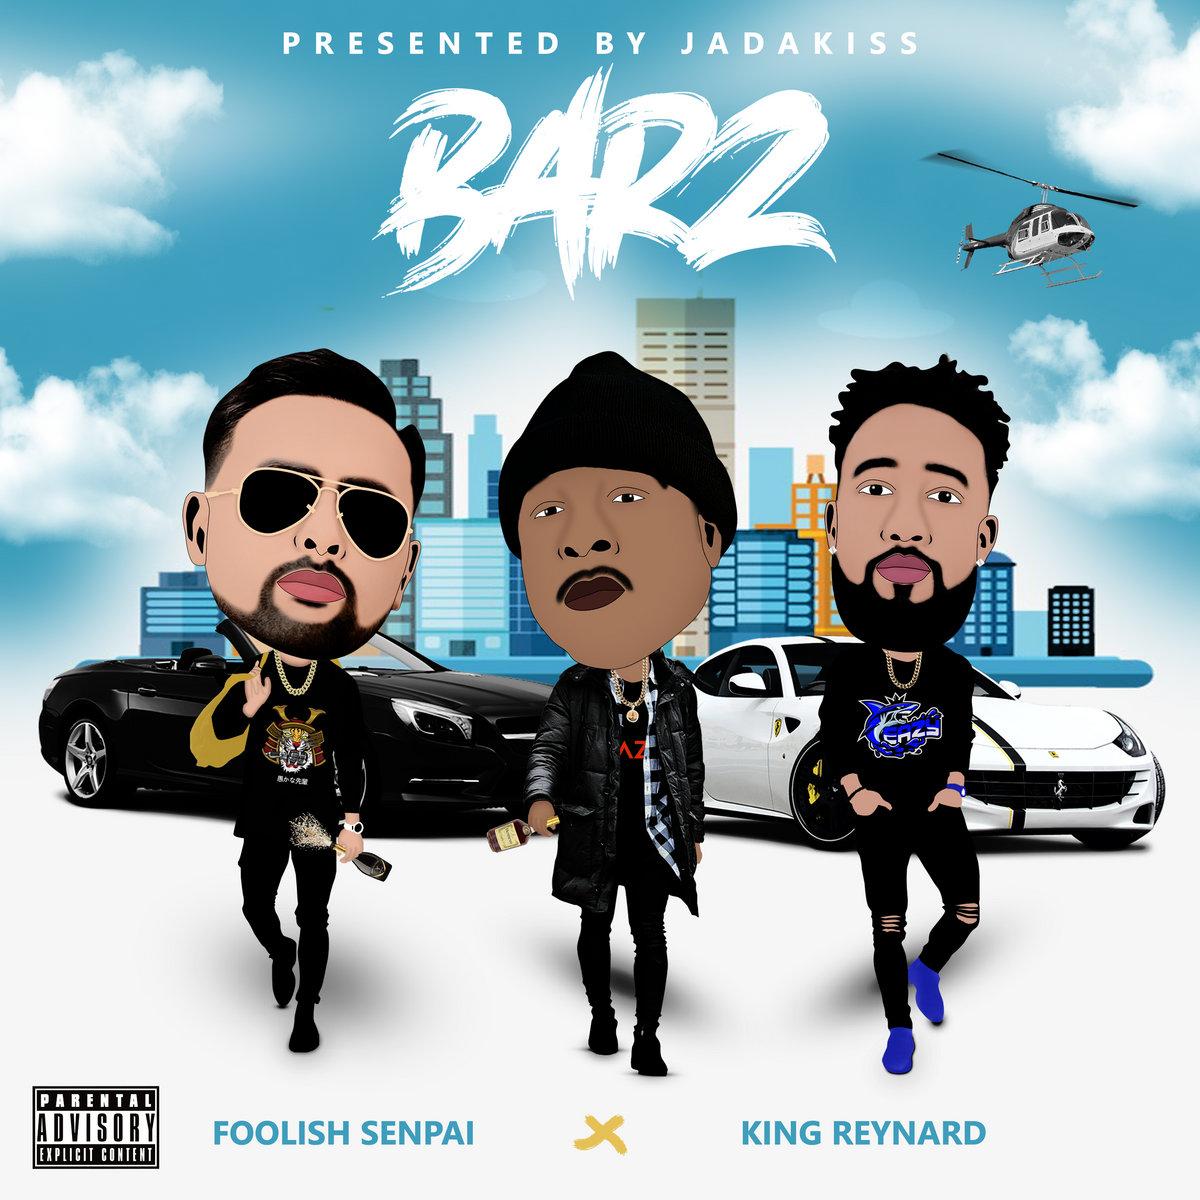 Presented by Jadakiss: BARZ by Foolish Senpai & King Reynard